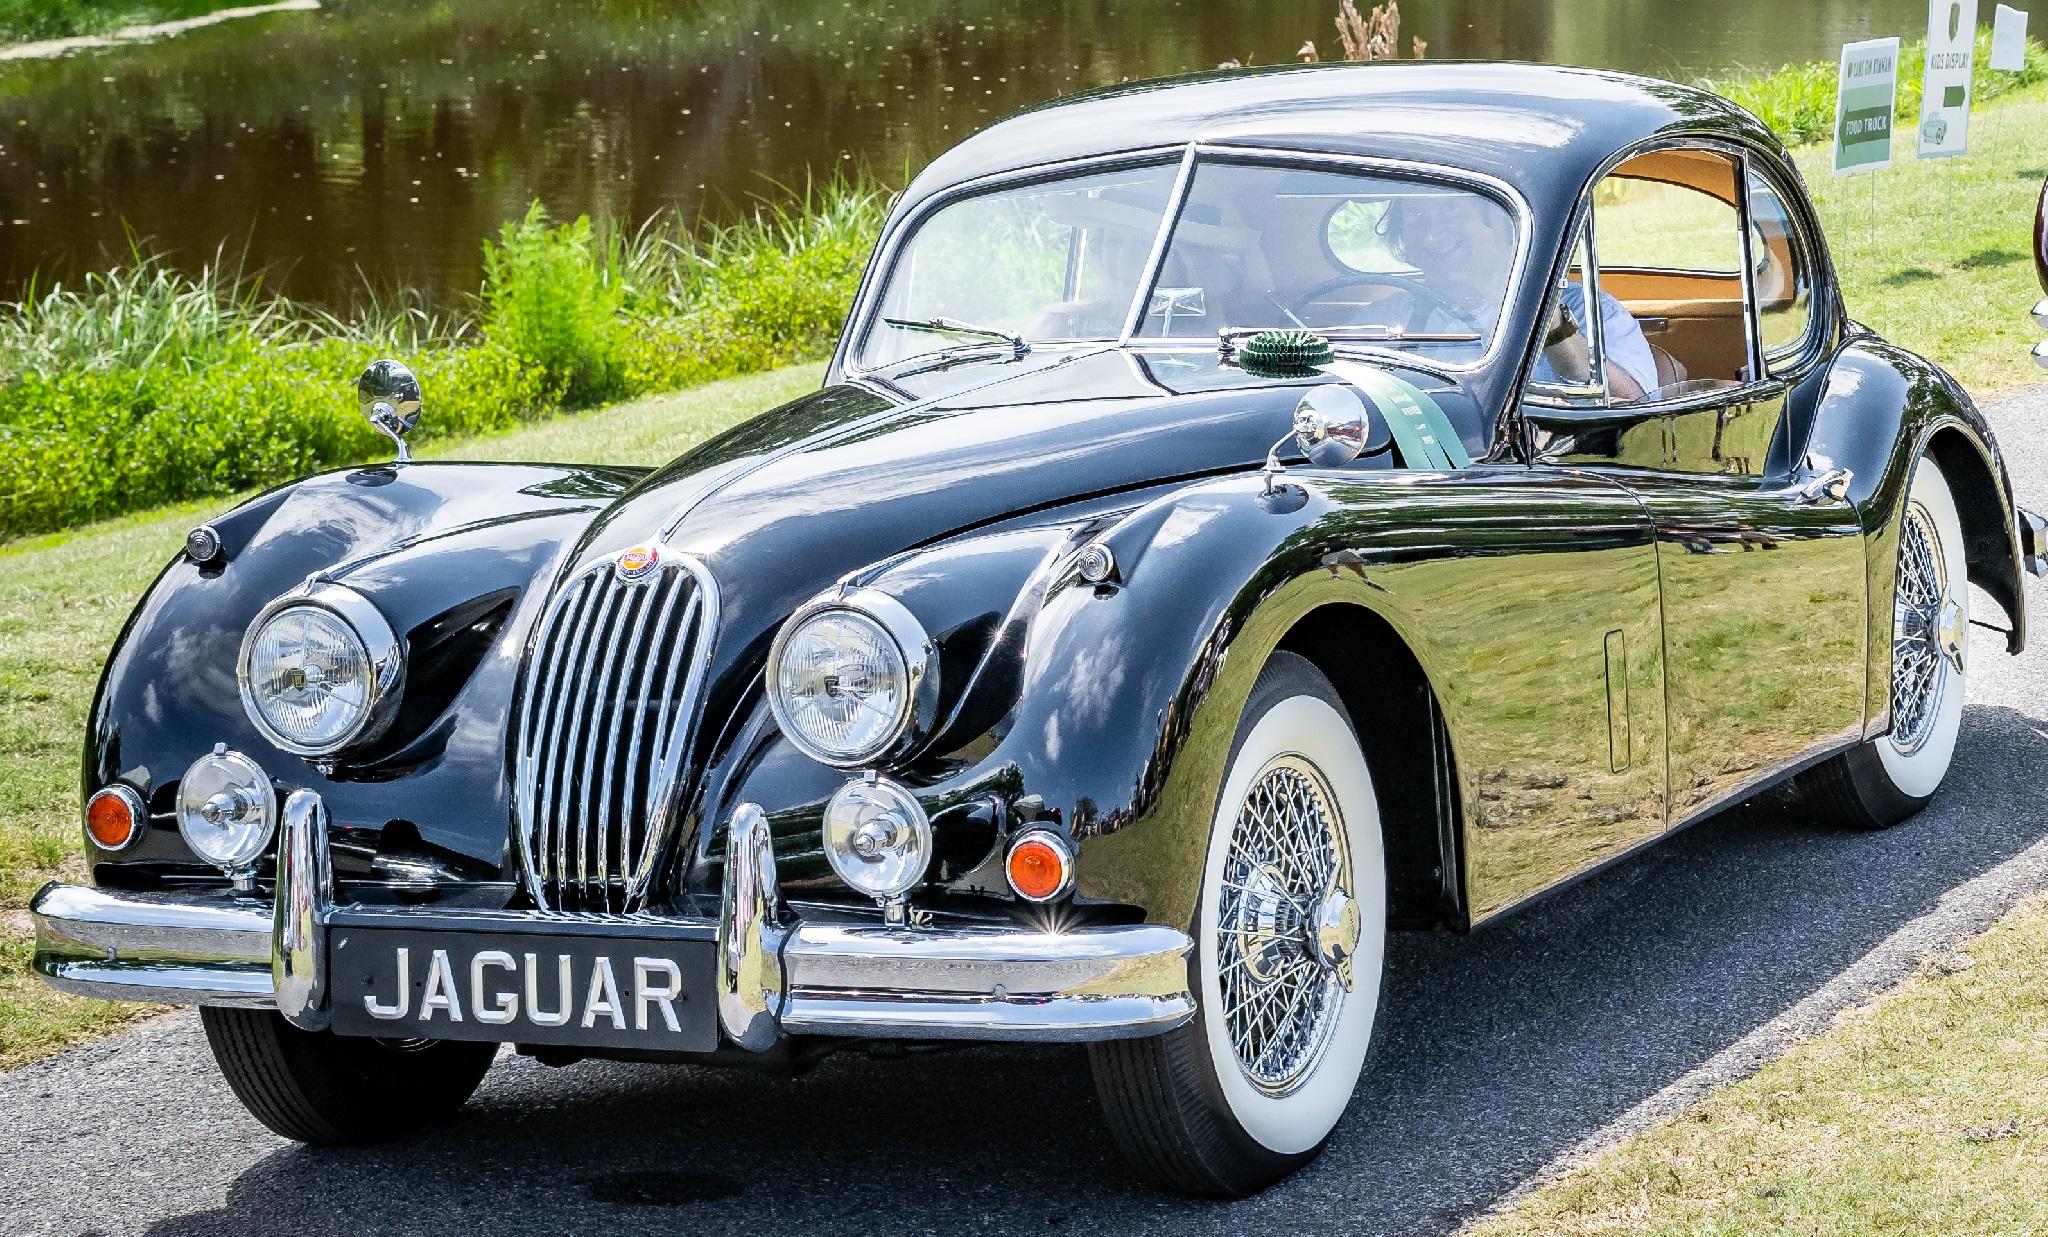 Class Award British - Scott & Natalie Bluestein's '56 Jaguar XK140